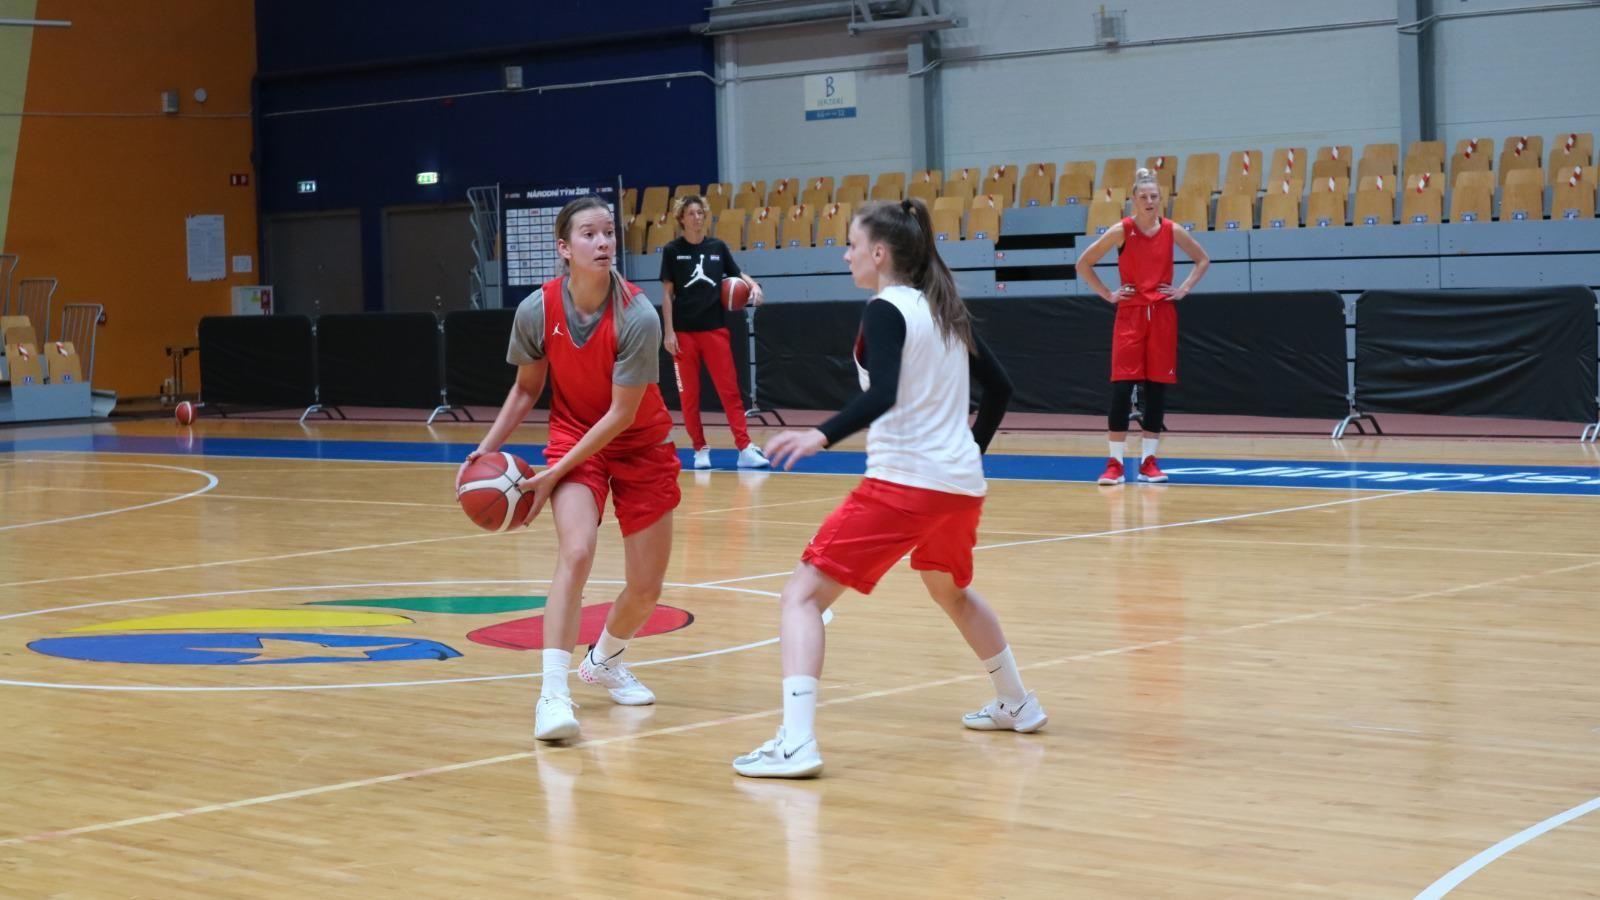 Erjavec To Play With Croatian National Women's Team